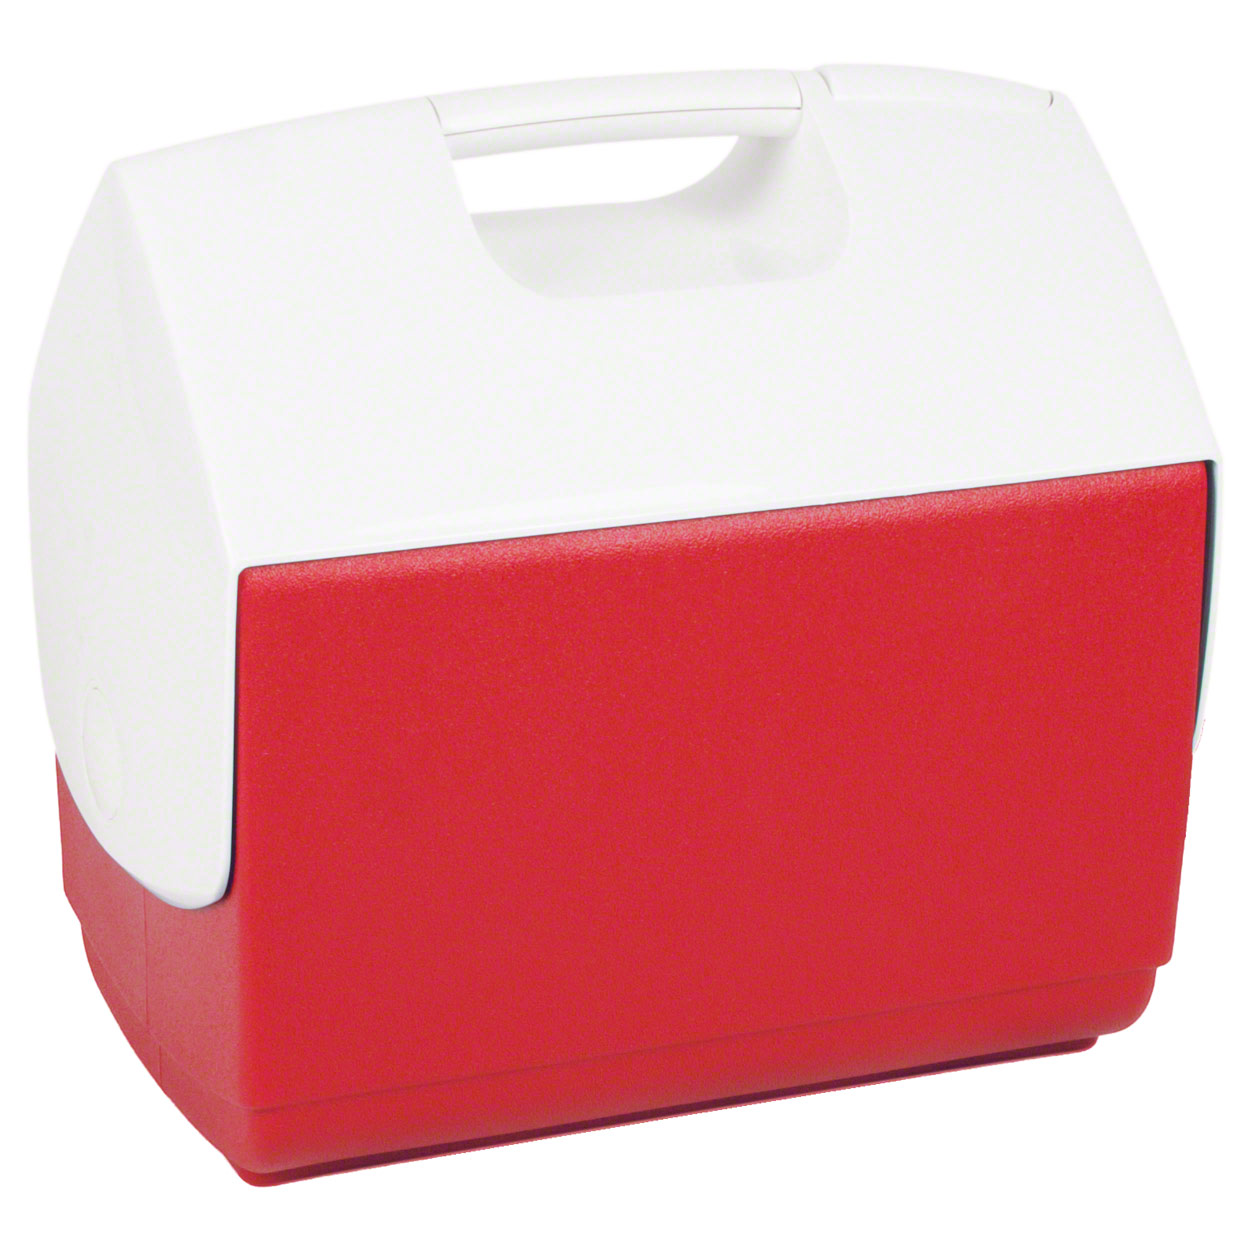 eisbox klein k hlbox k hltasche eiskoffer erste hilfe. Black Bedroom Furniture Sets. Home Design Ideas